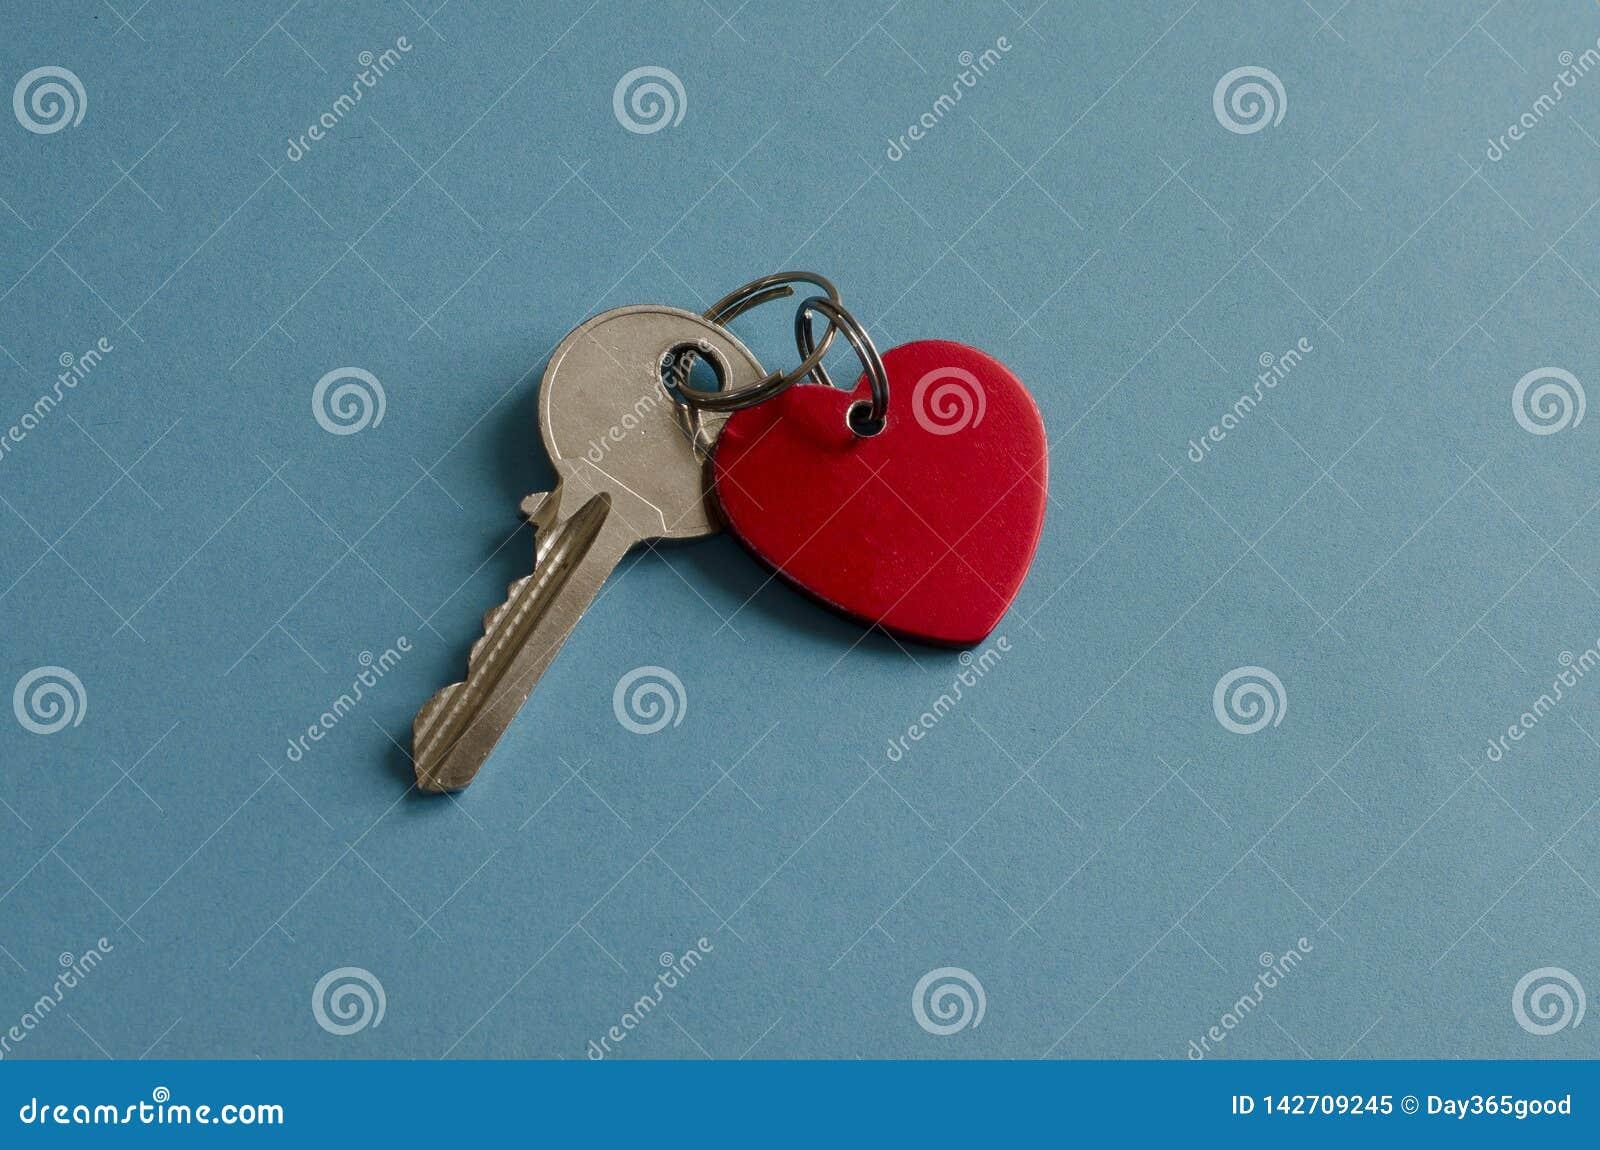 Red heart key chain. Key. Blue background